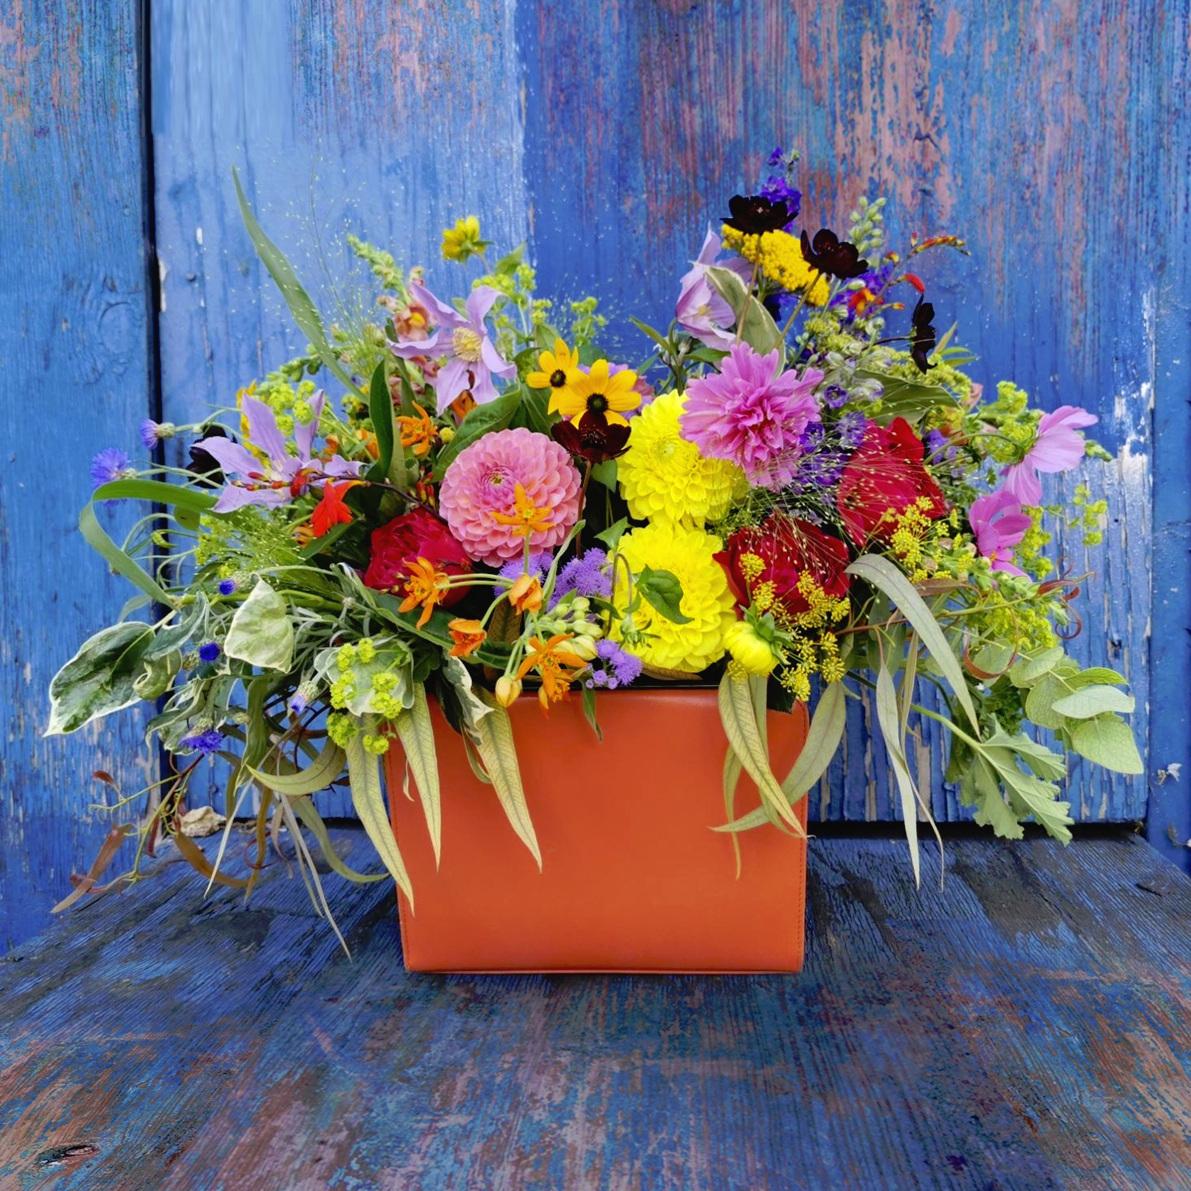 flower handbag new crop.jpg